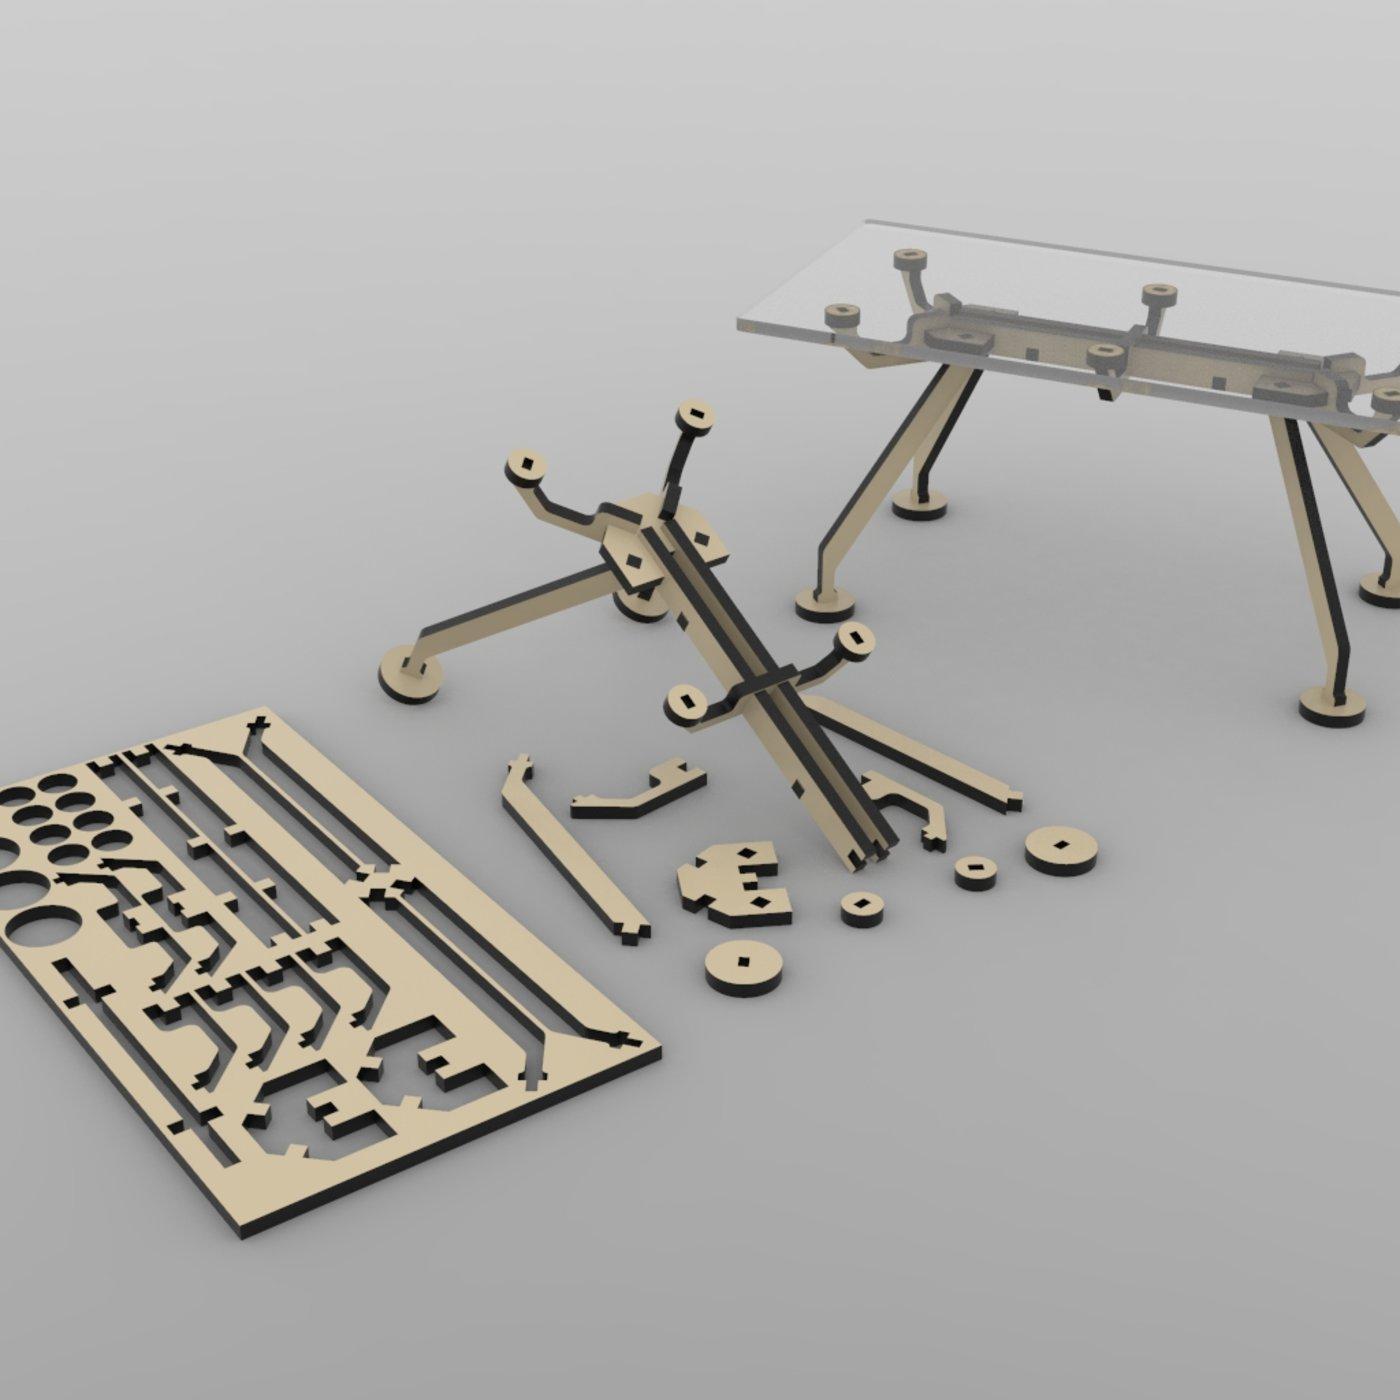 Nomos tables ready for lasercut